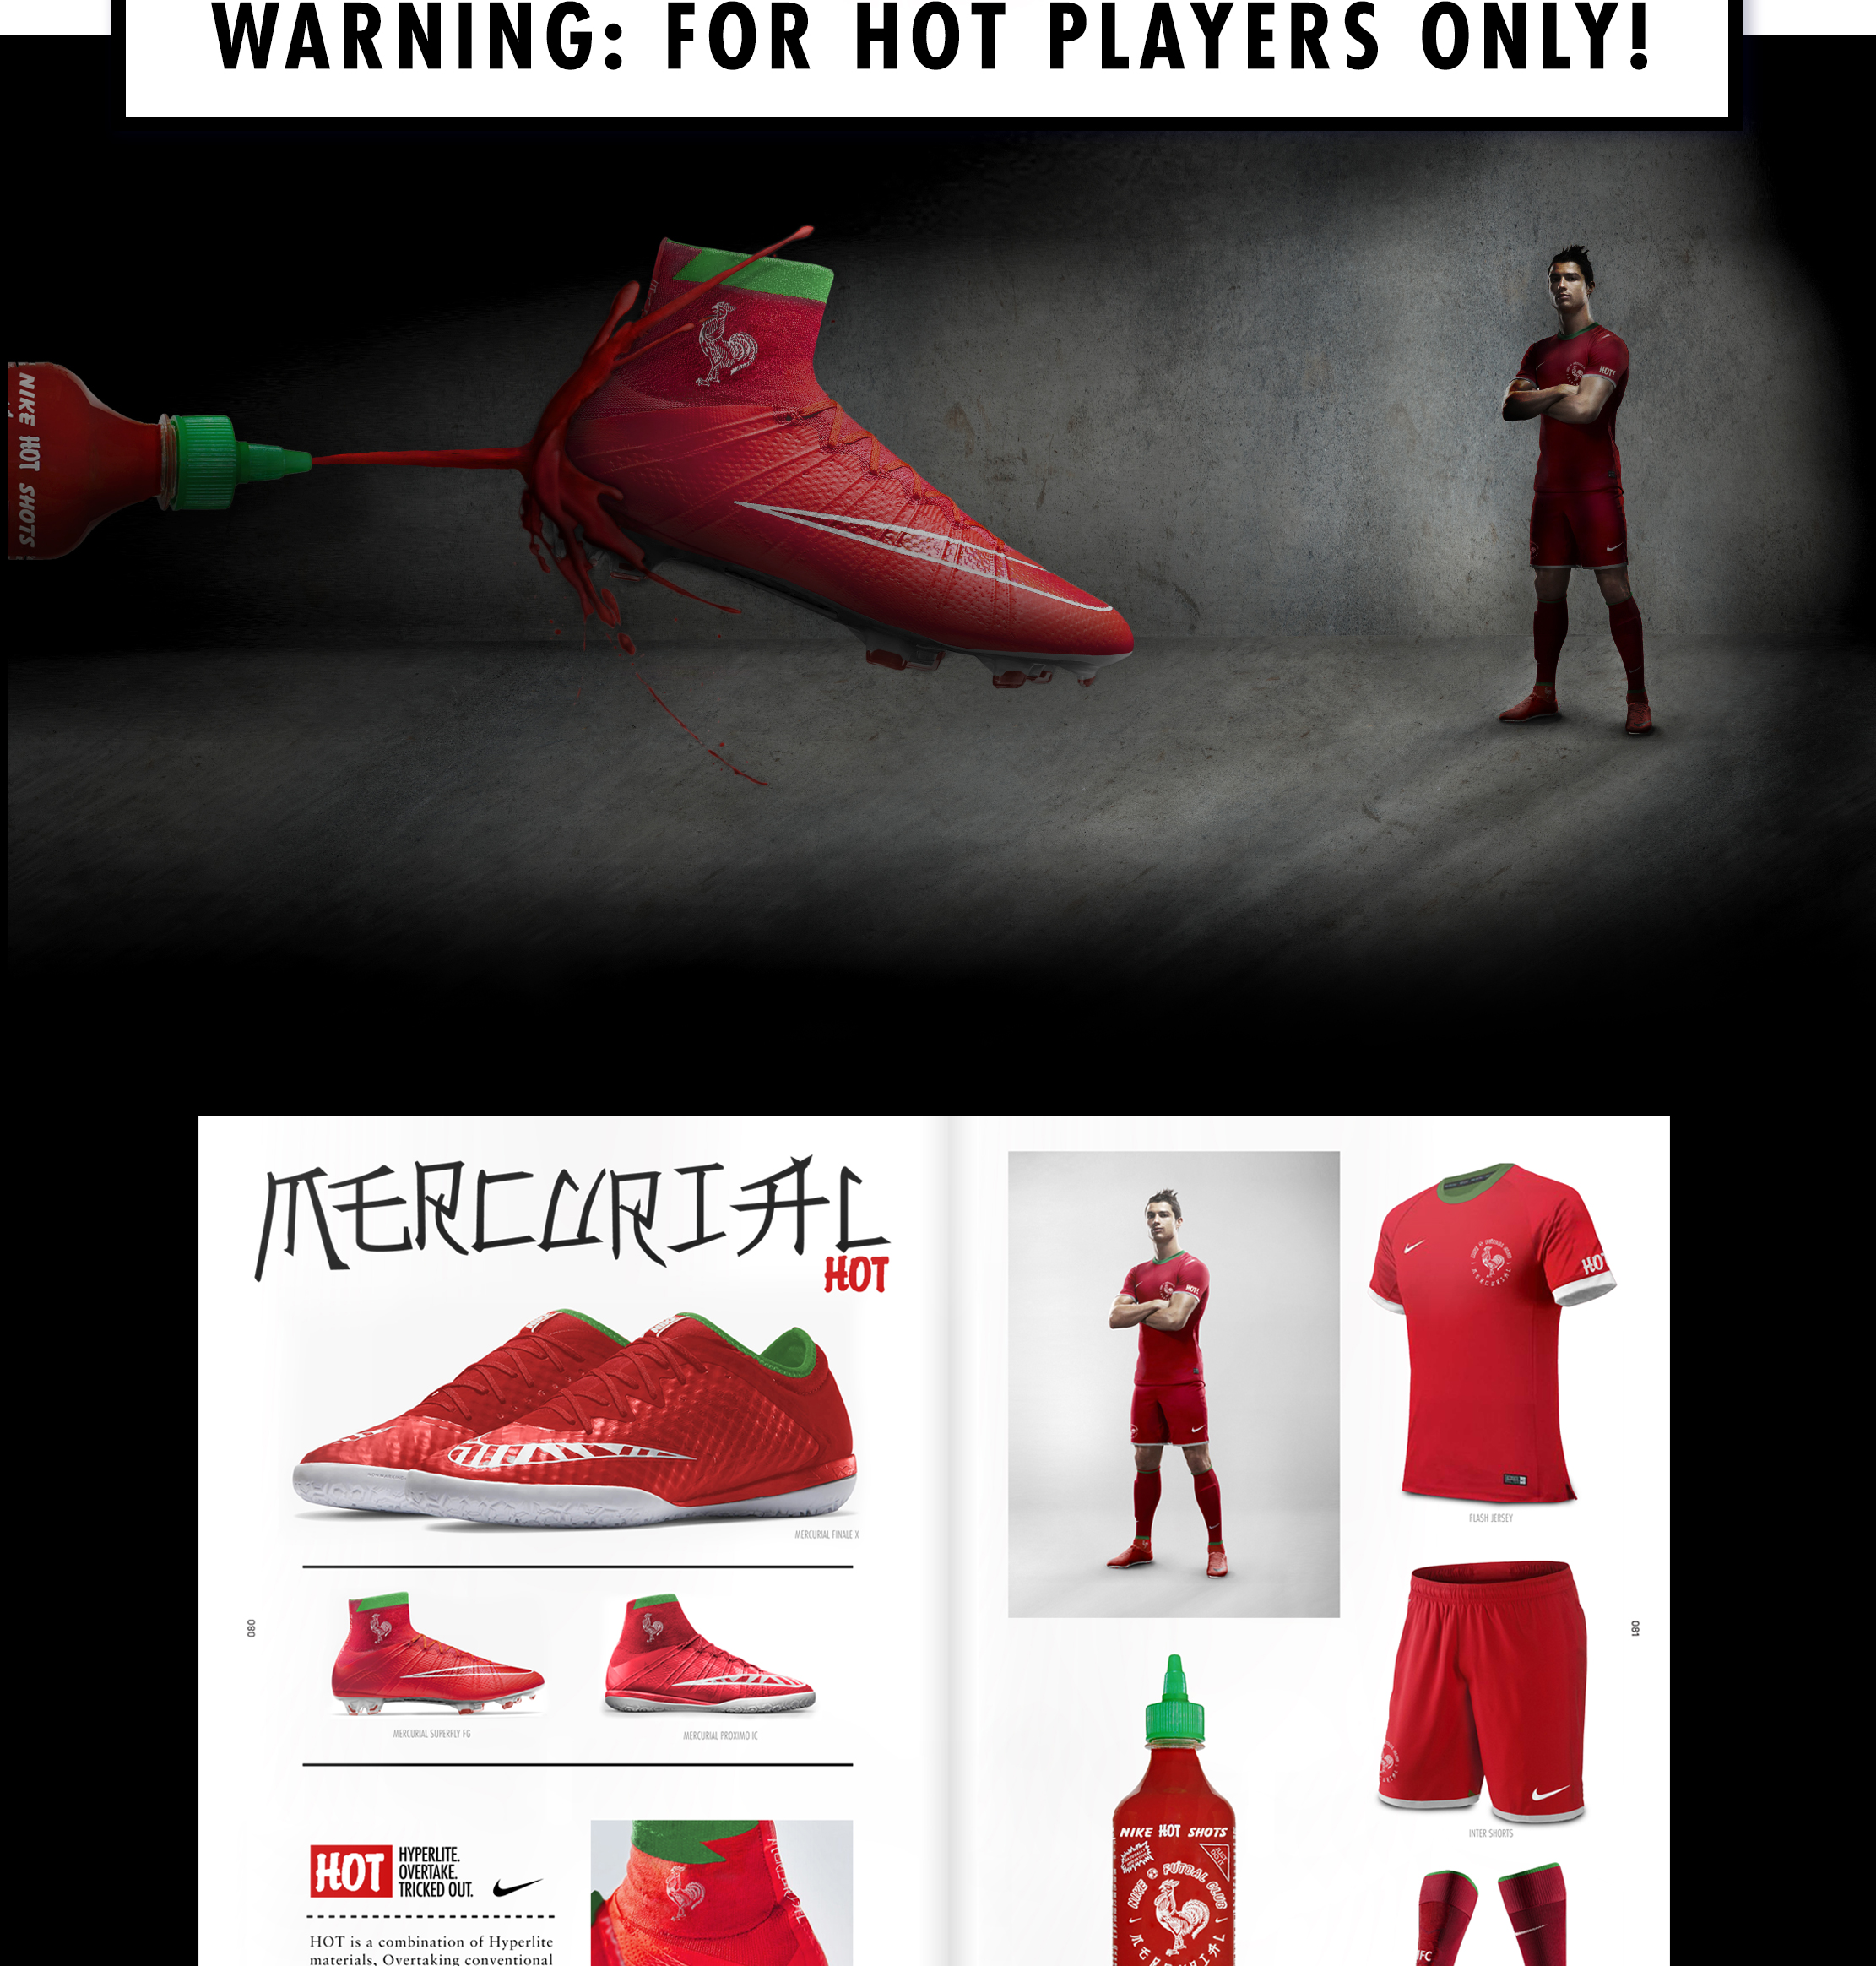 004-02-Nike_Timeline-My_Nike_Pieces-HOT.jpg